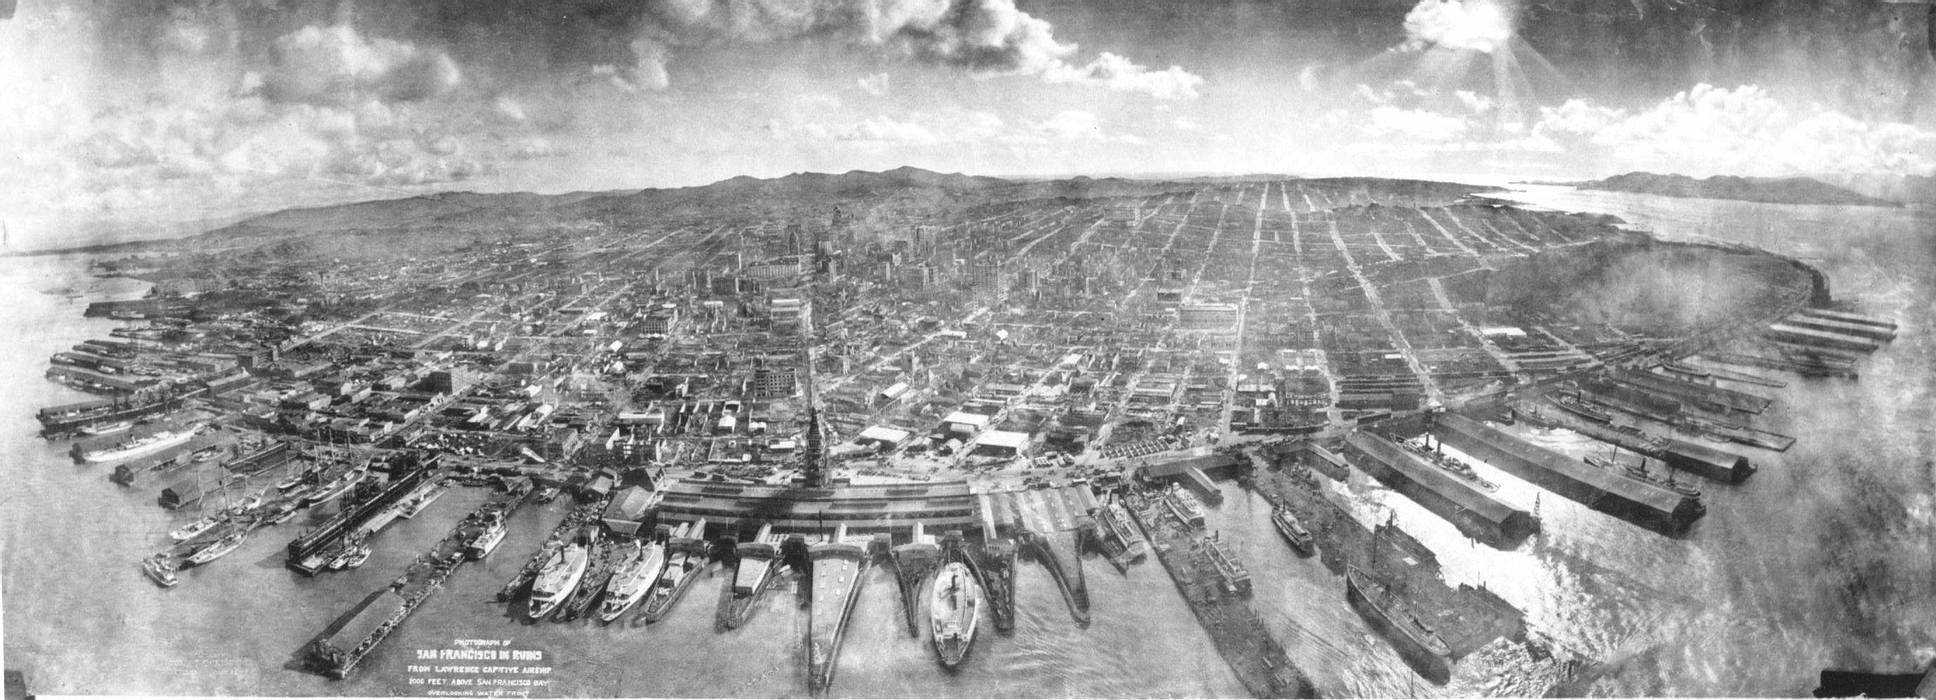 file 1906 san francisco earthquake aftermath panorama jpg